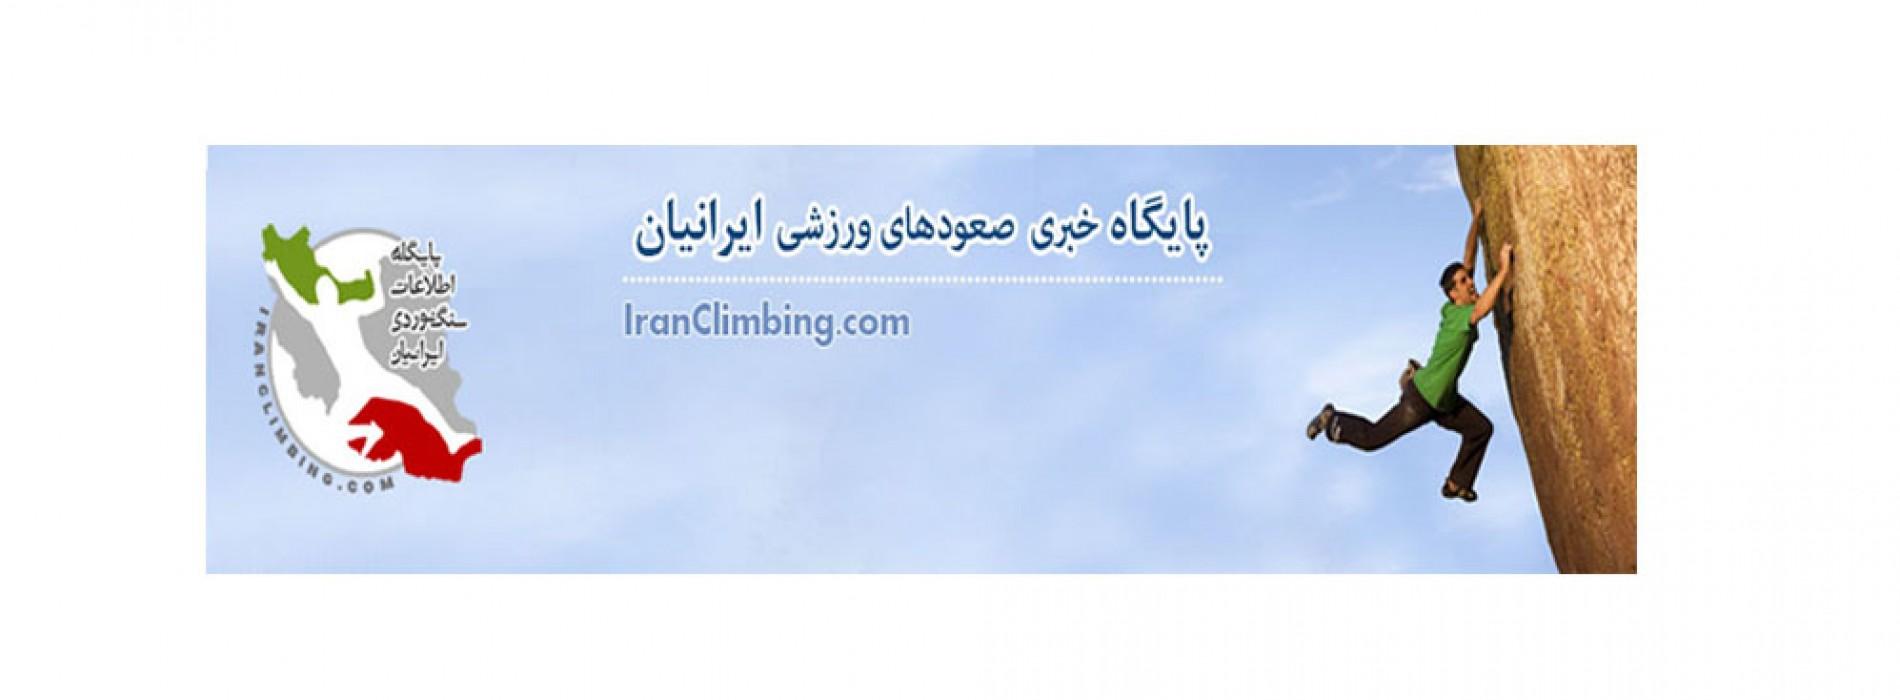 برنامه مسابقات شش ماهه اول 1395 کارگروه مسابقات و لیگ